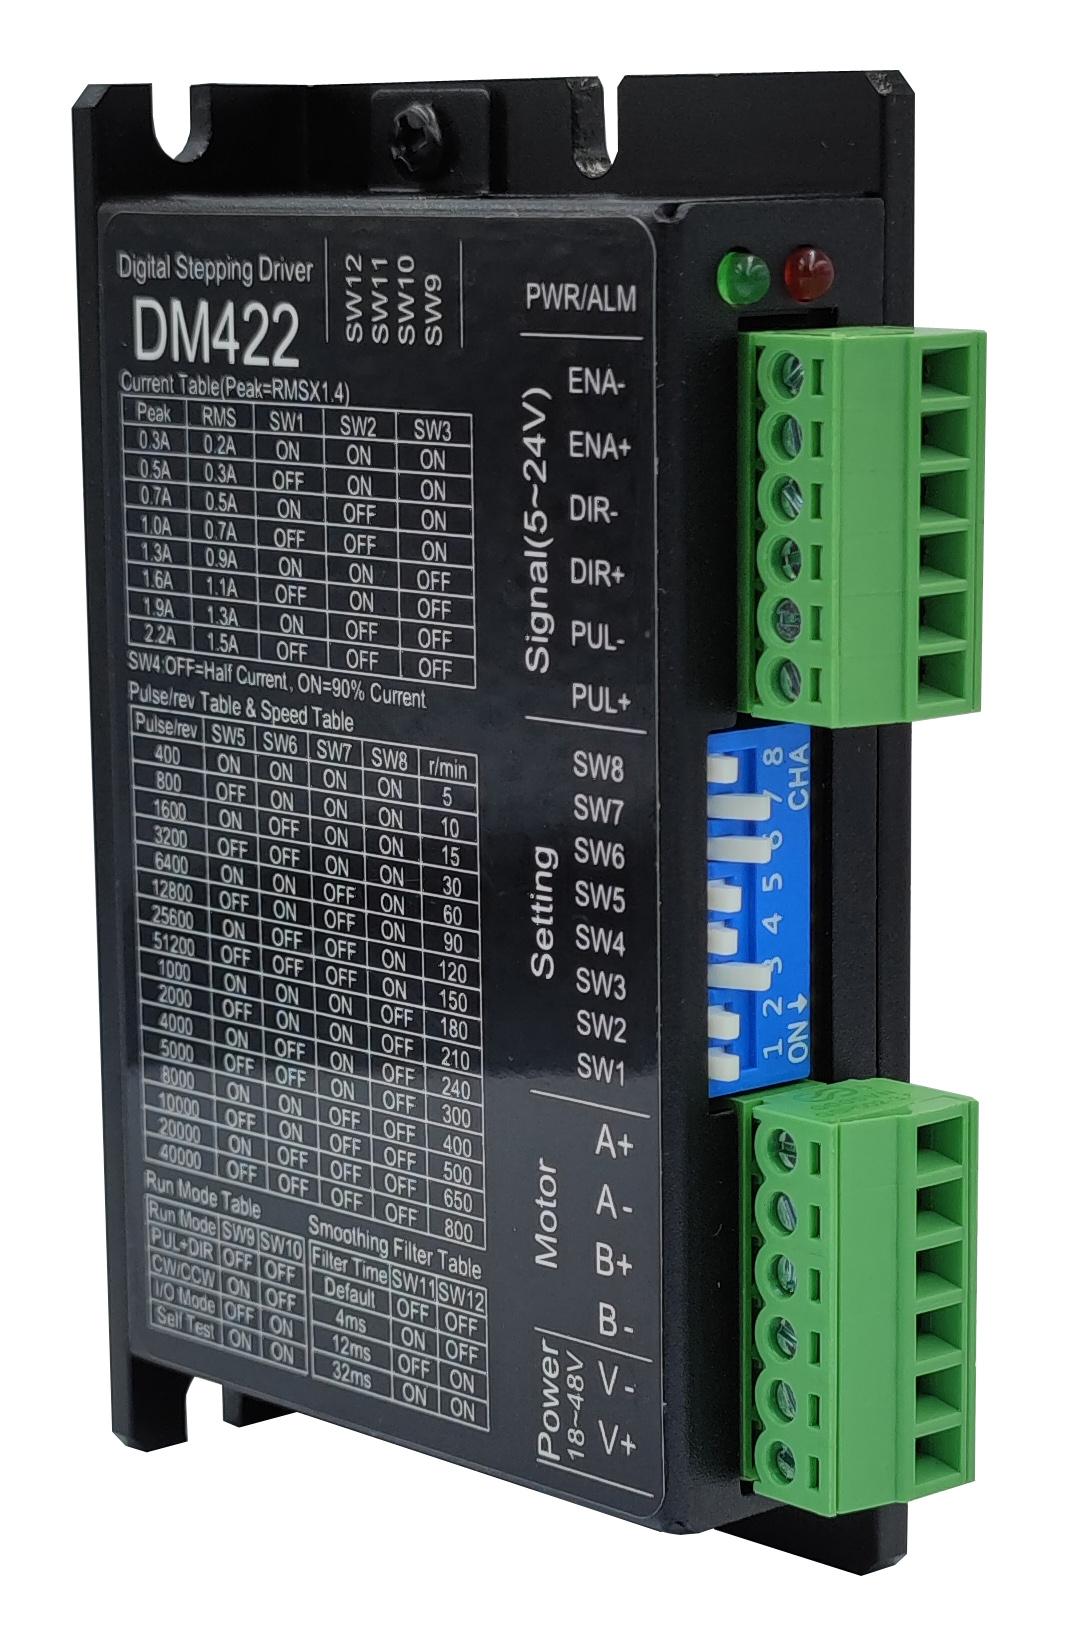 DM422